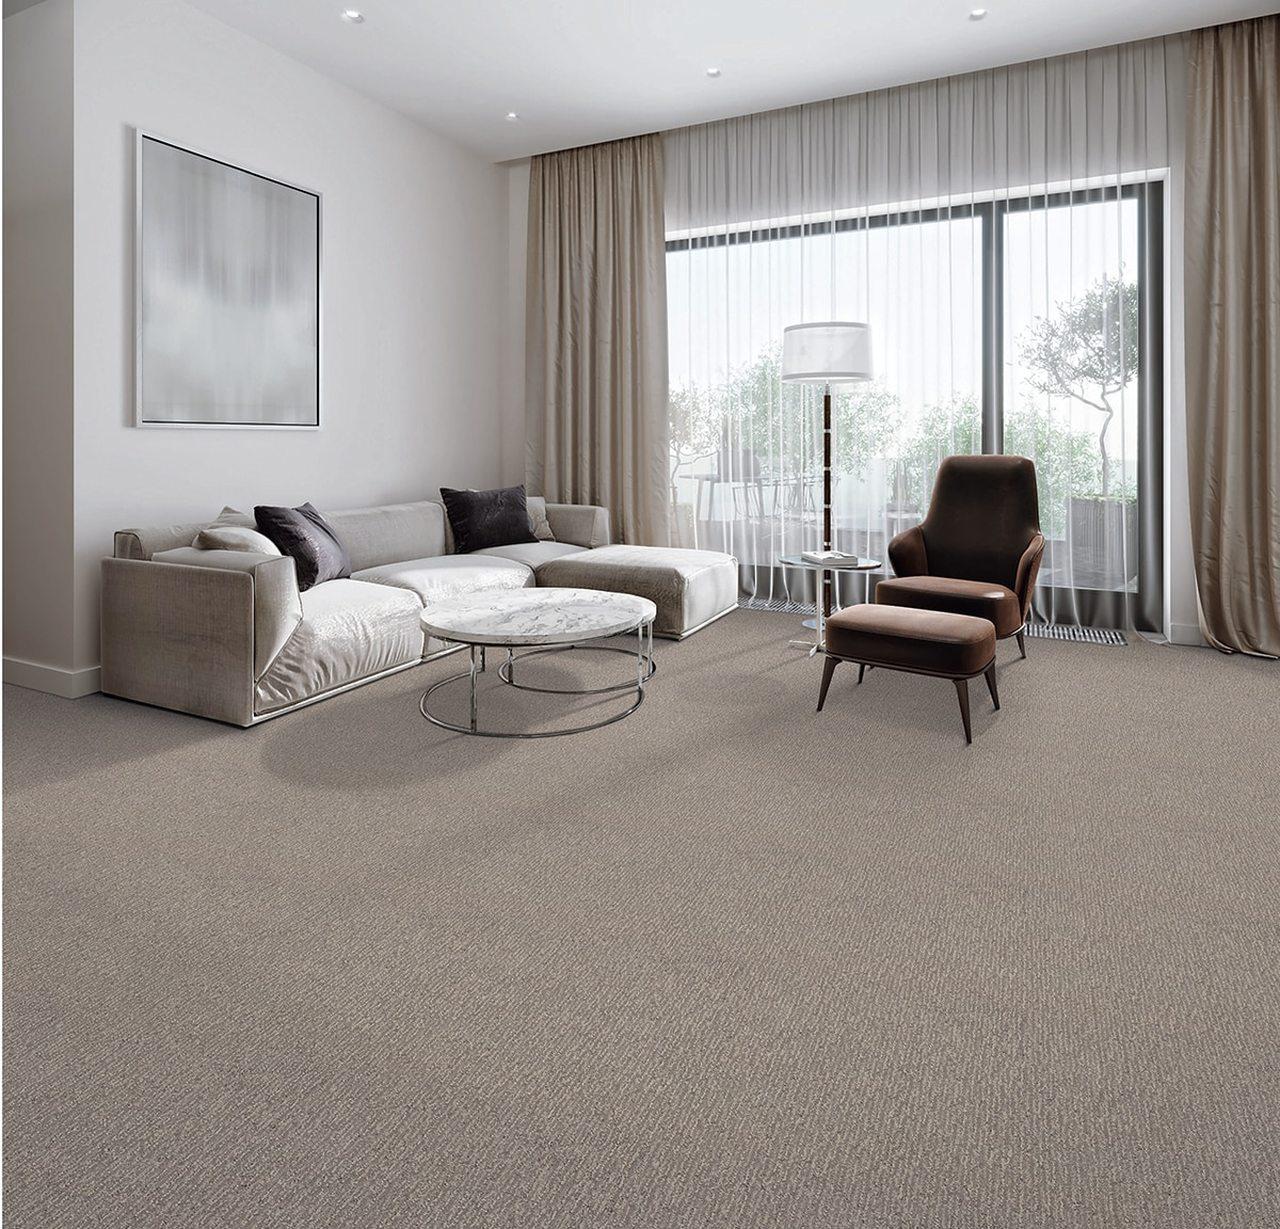 dream weaver carpet review image